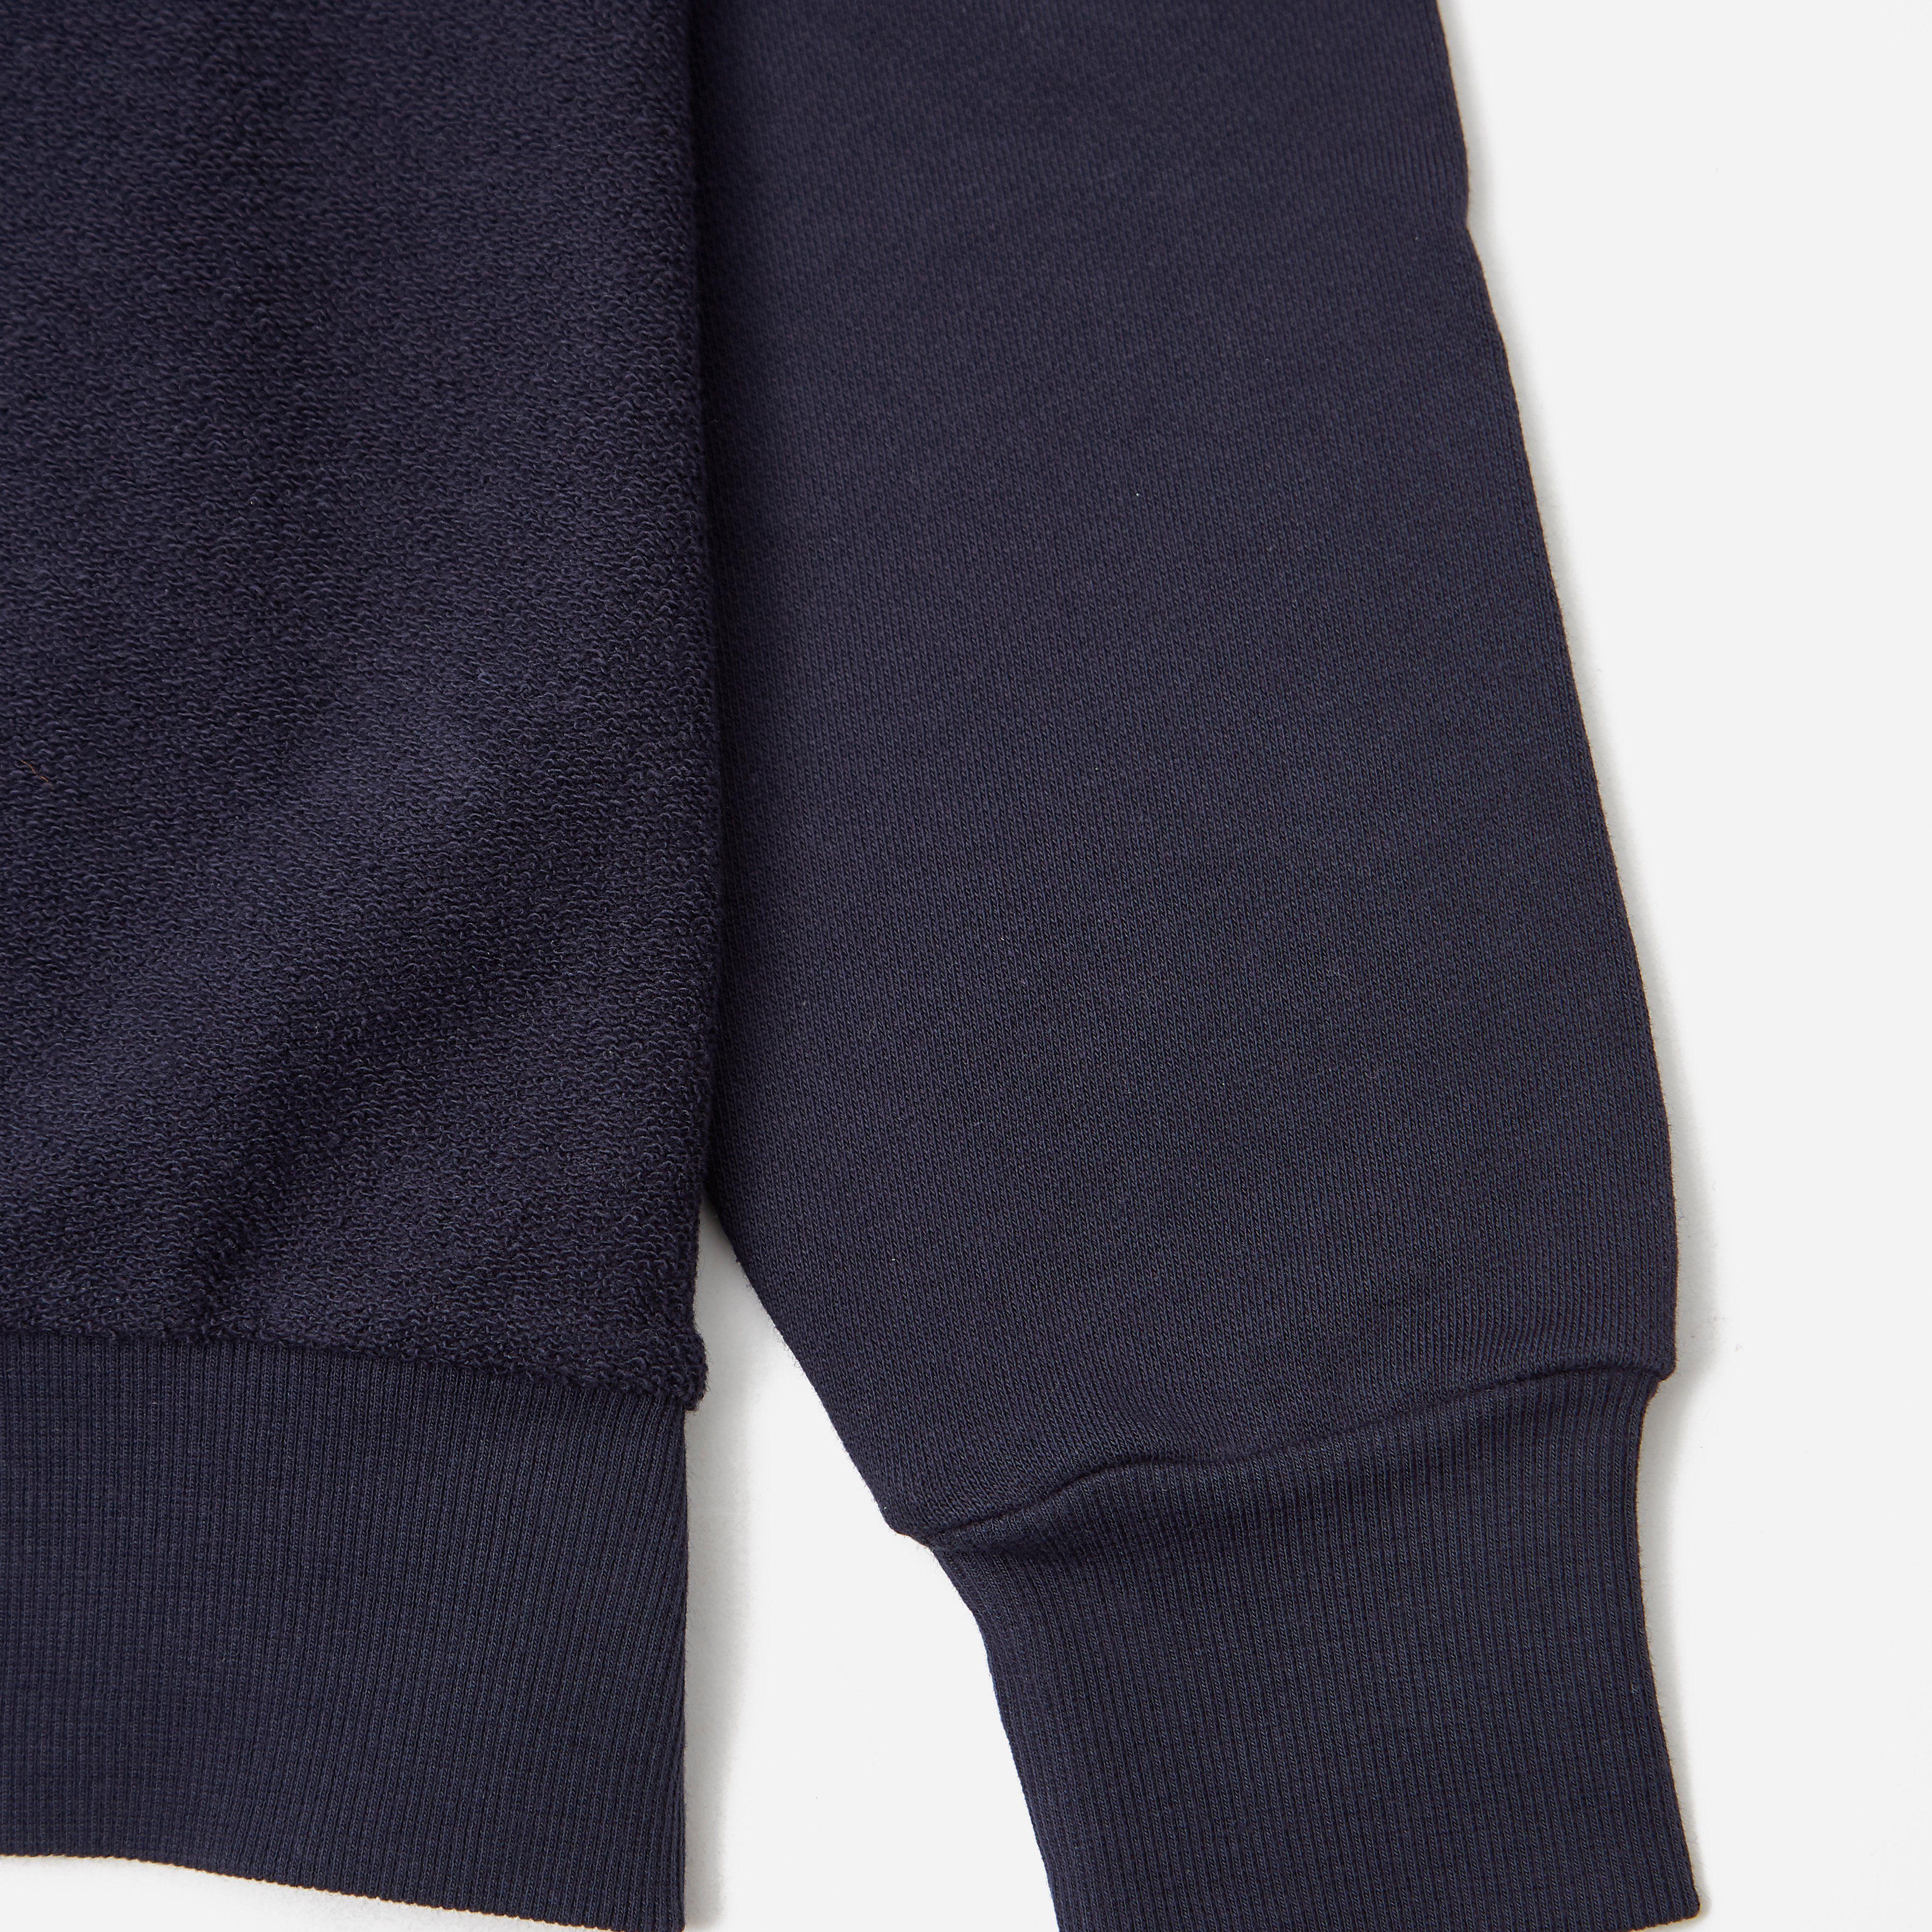 Les Basics Le Zip Sweatshirt